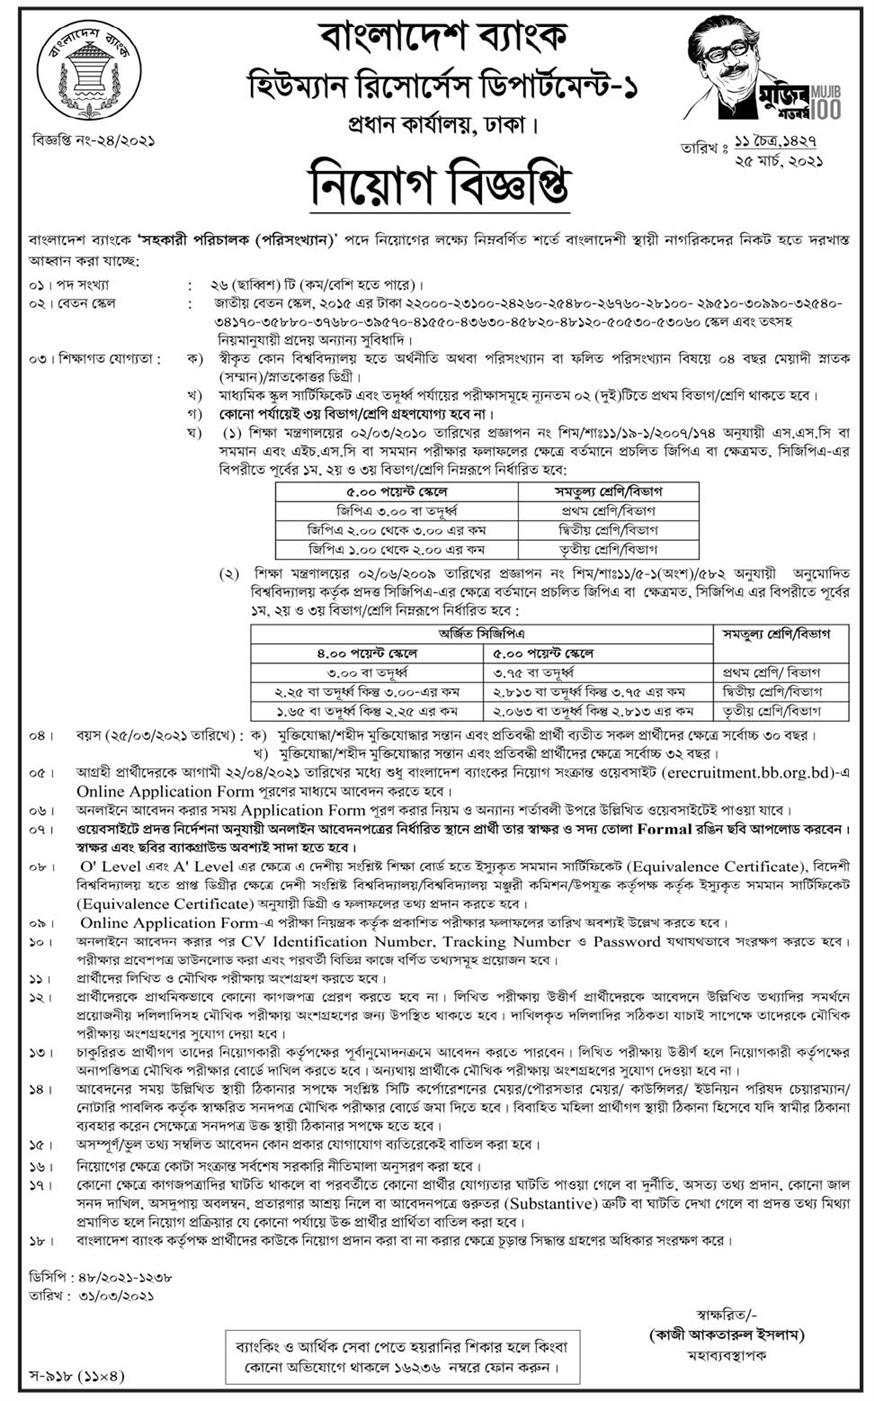 Bangladesh Bank Circular for Assistant Director (statistics)